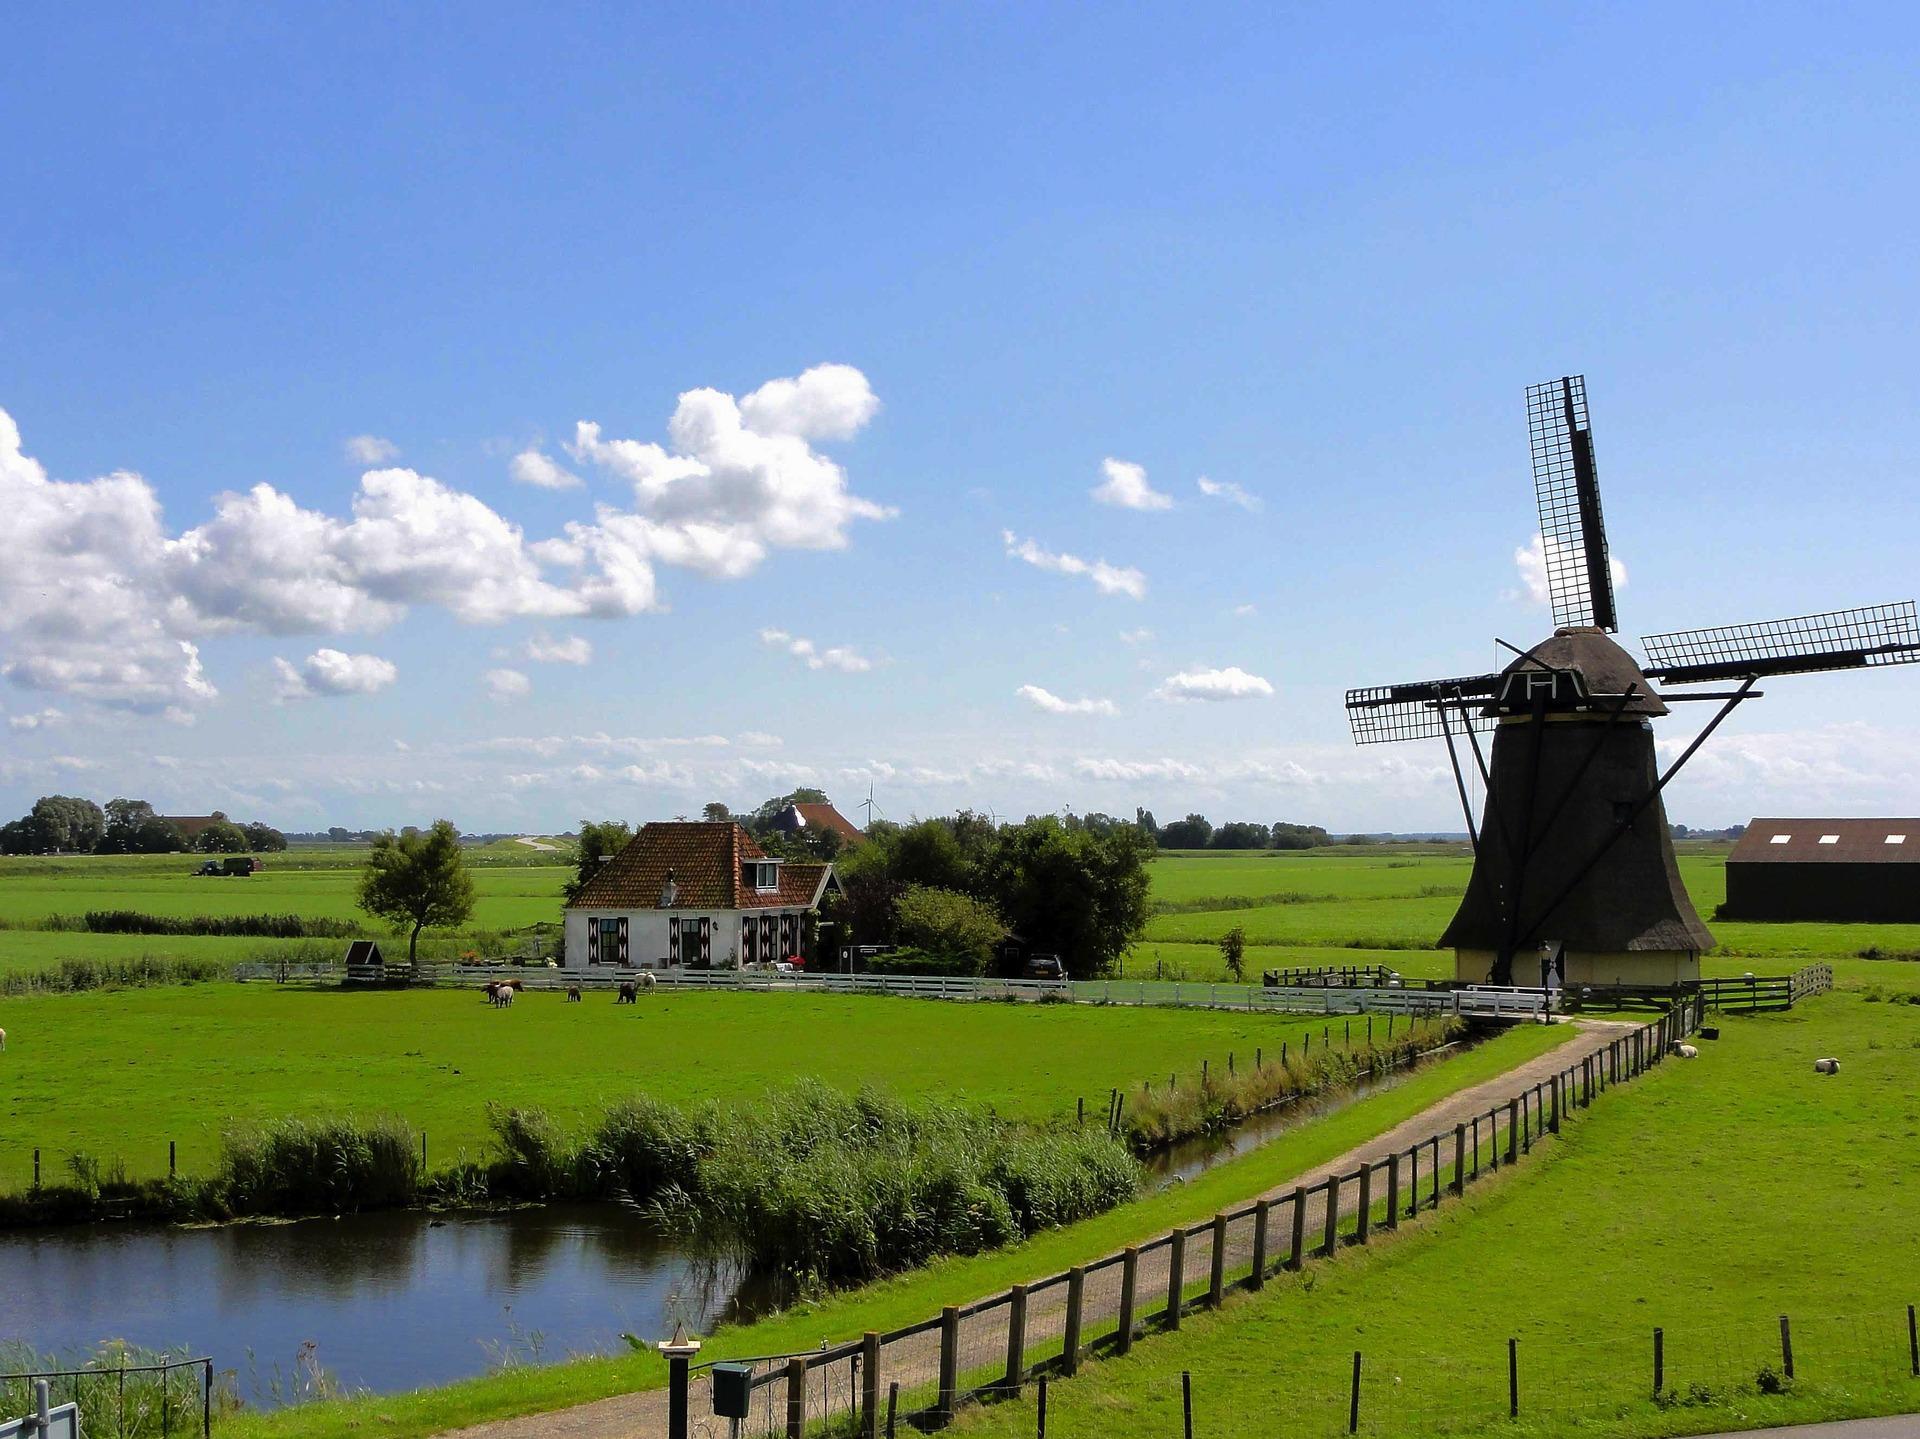 netherlands-97830_1920-1504650802132-1504650805502.jpg